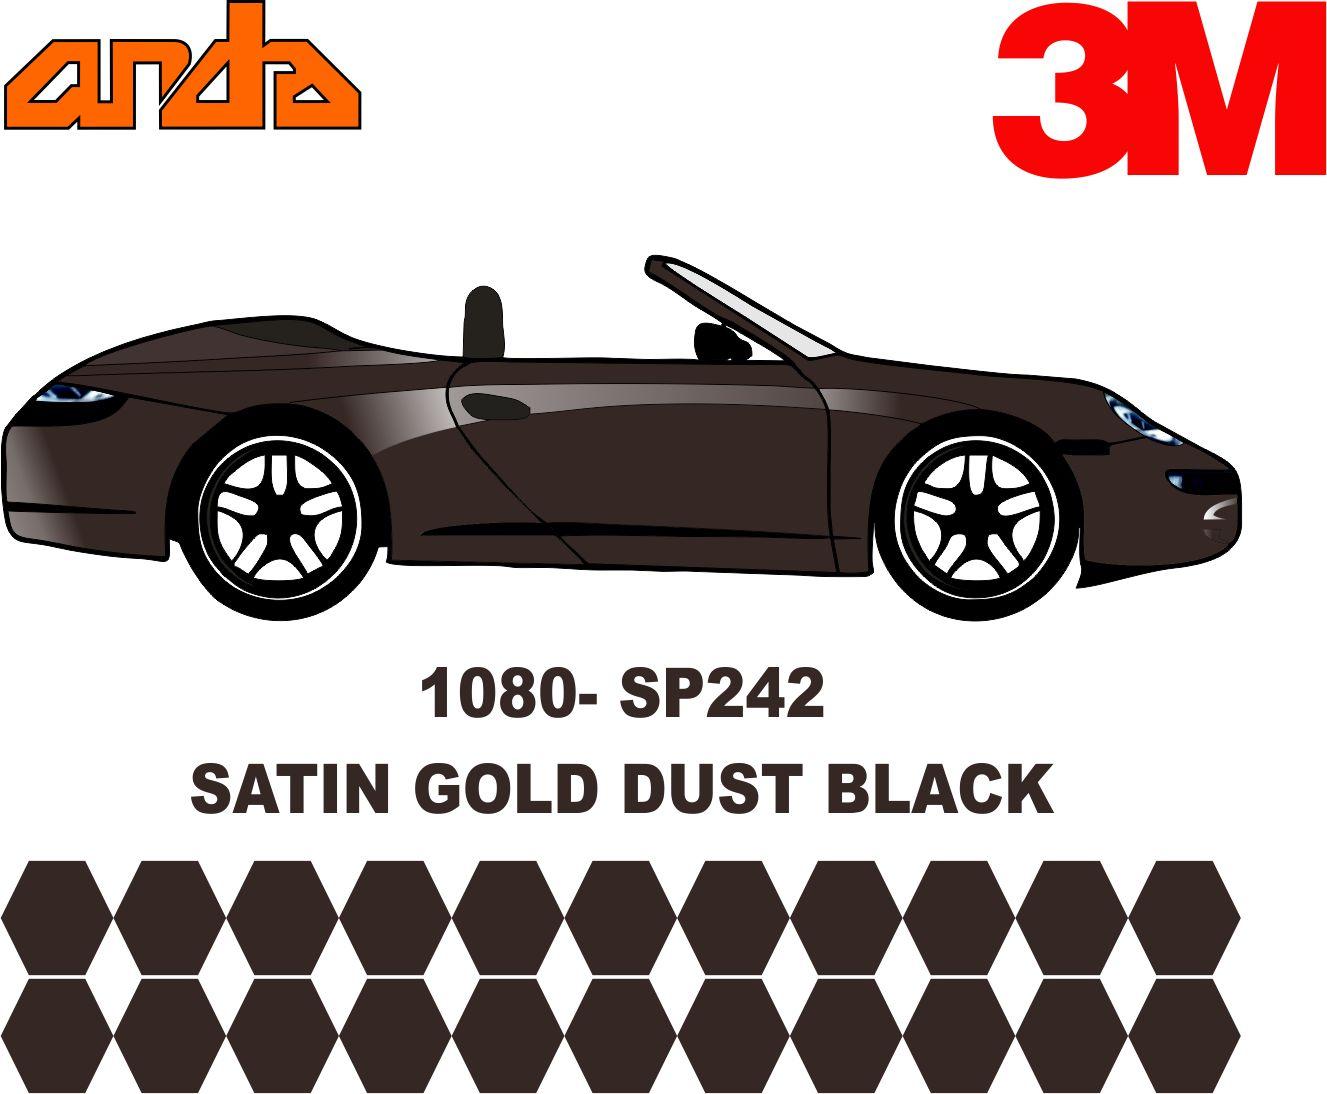 3M 1080-SP242 Satin Gold Dust Black 1